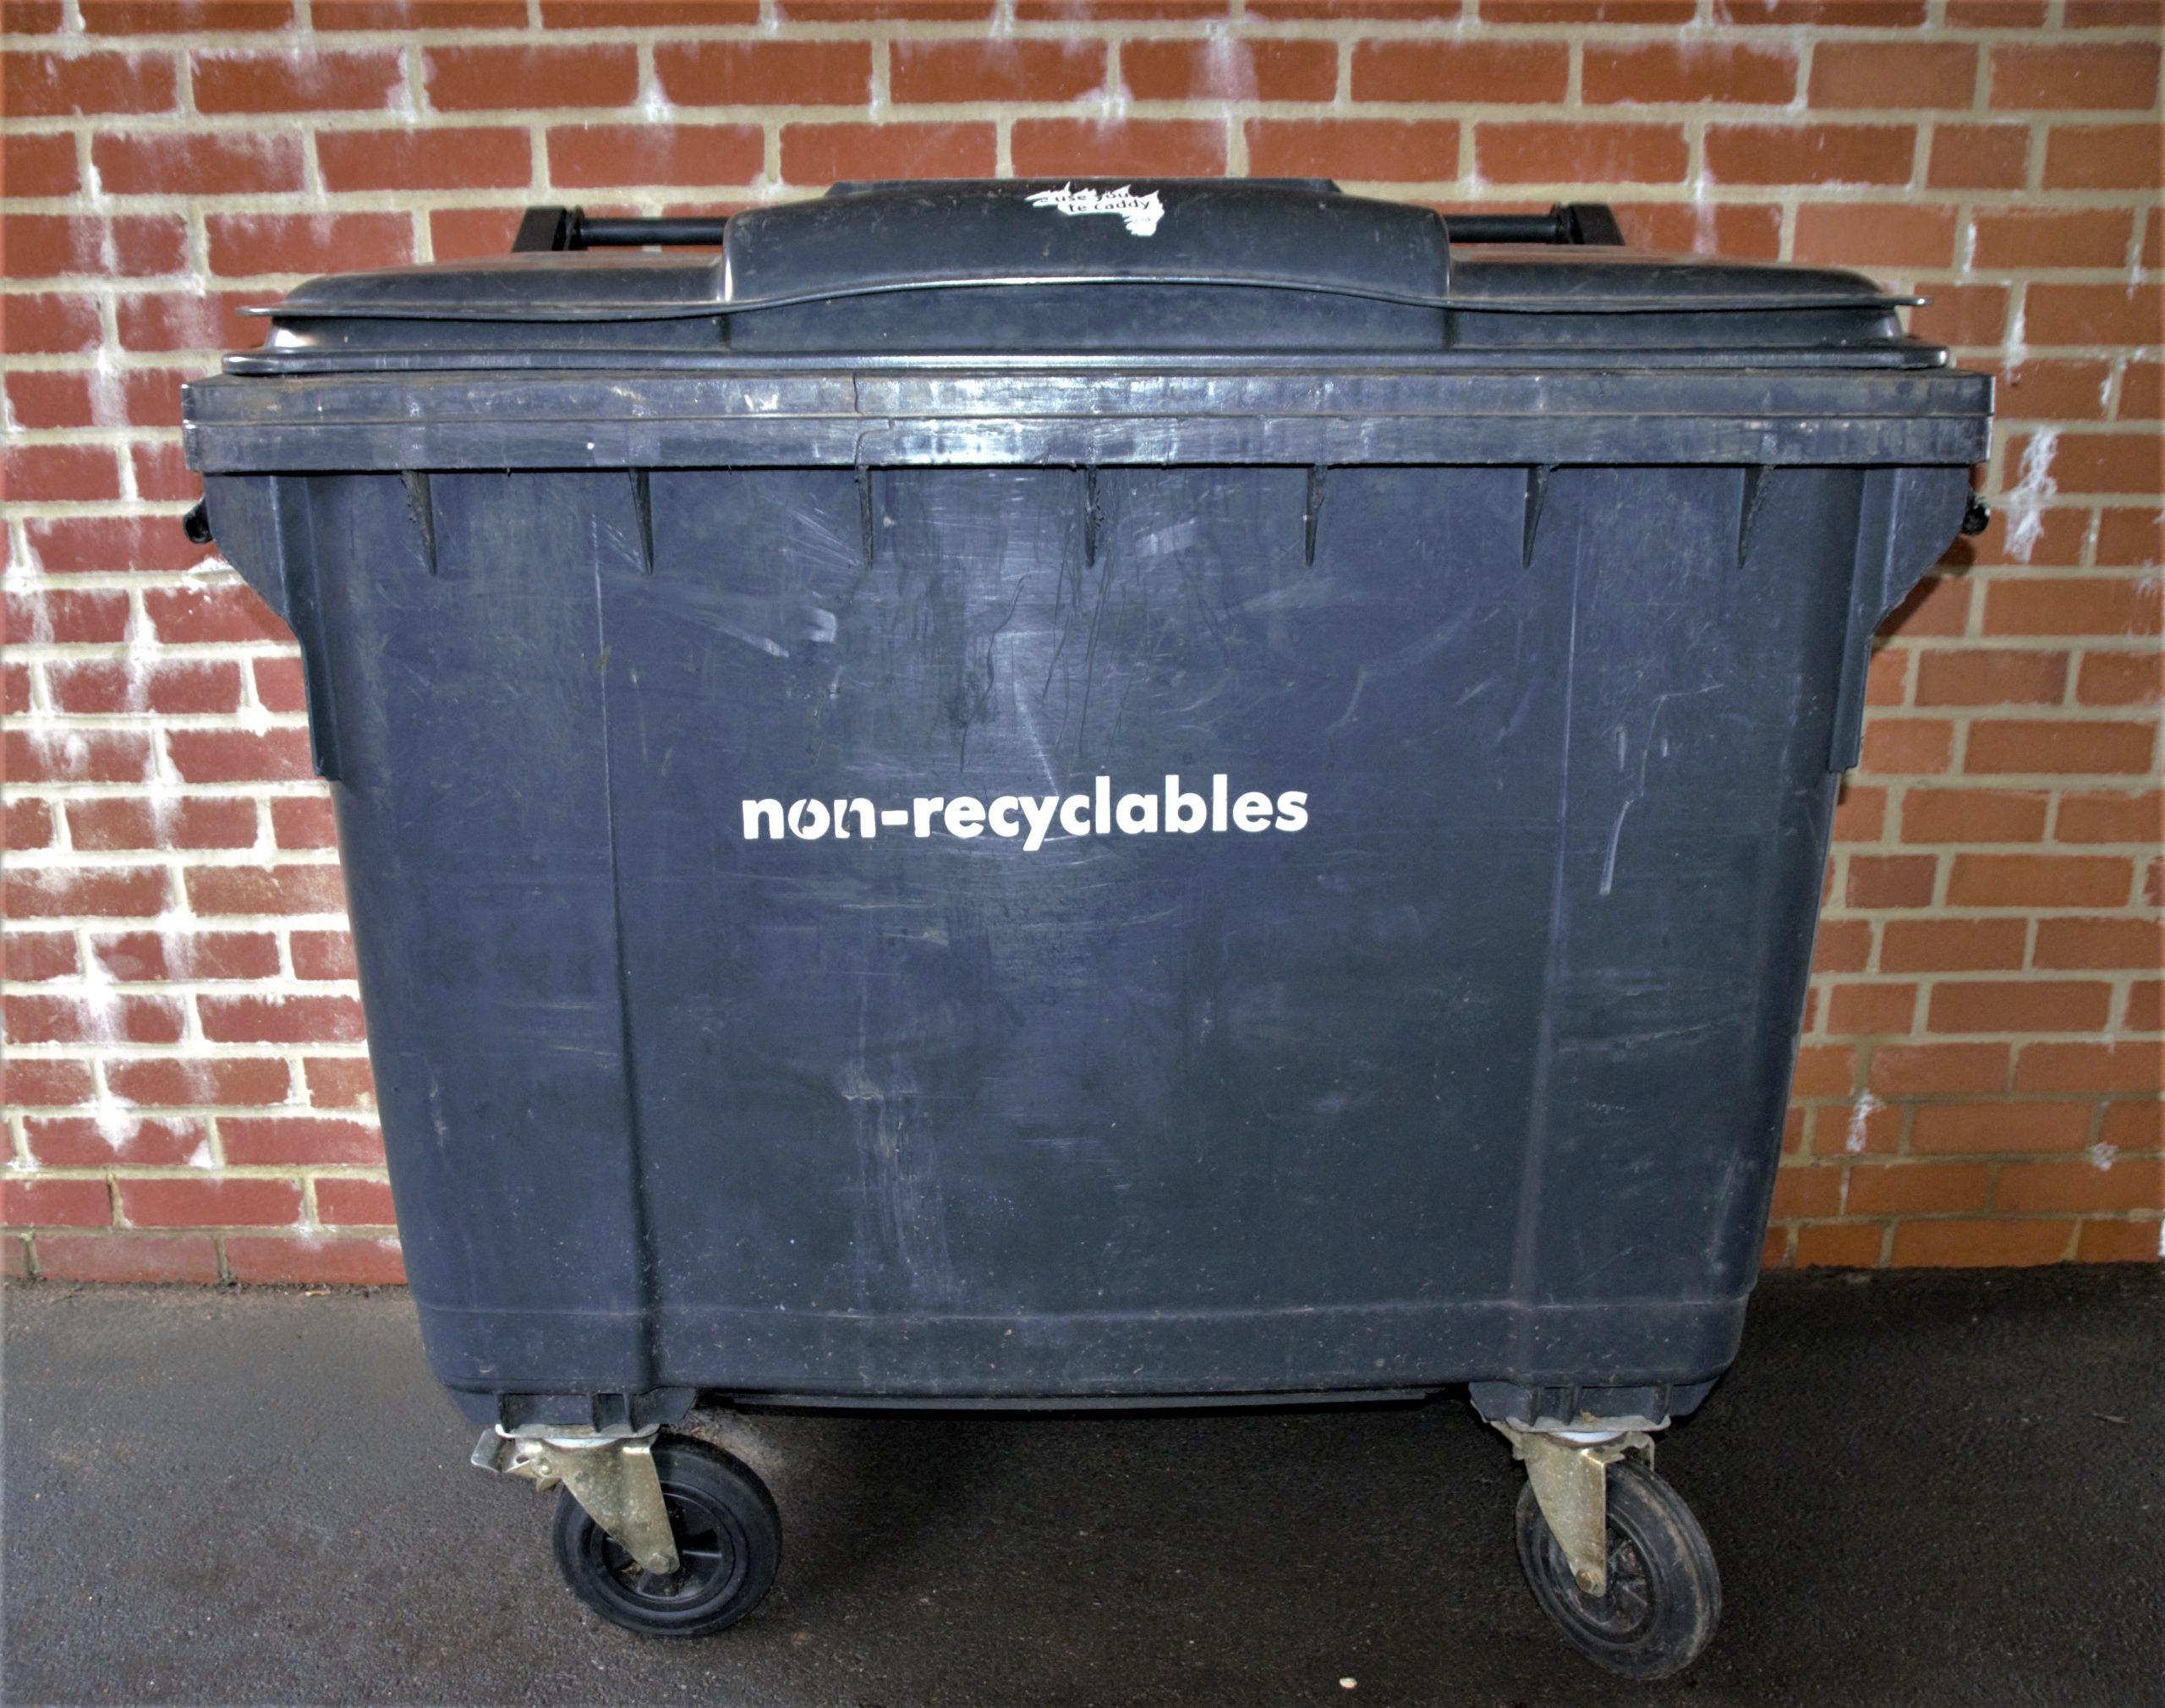 What can go in each bin (flats)?